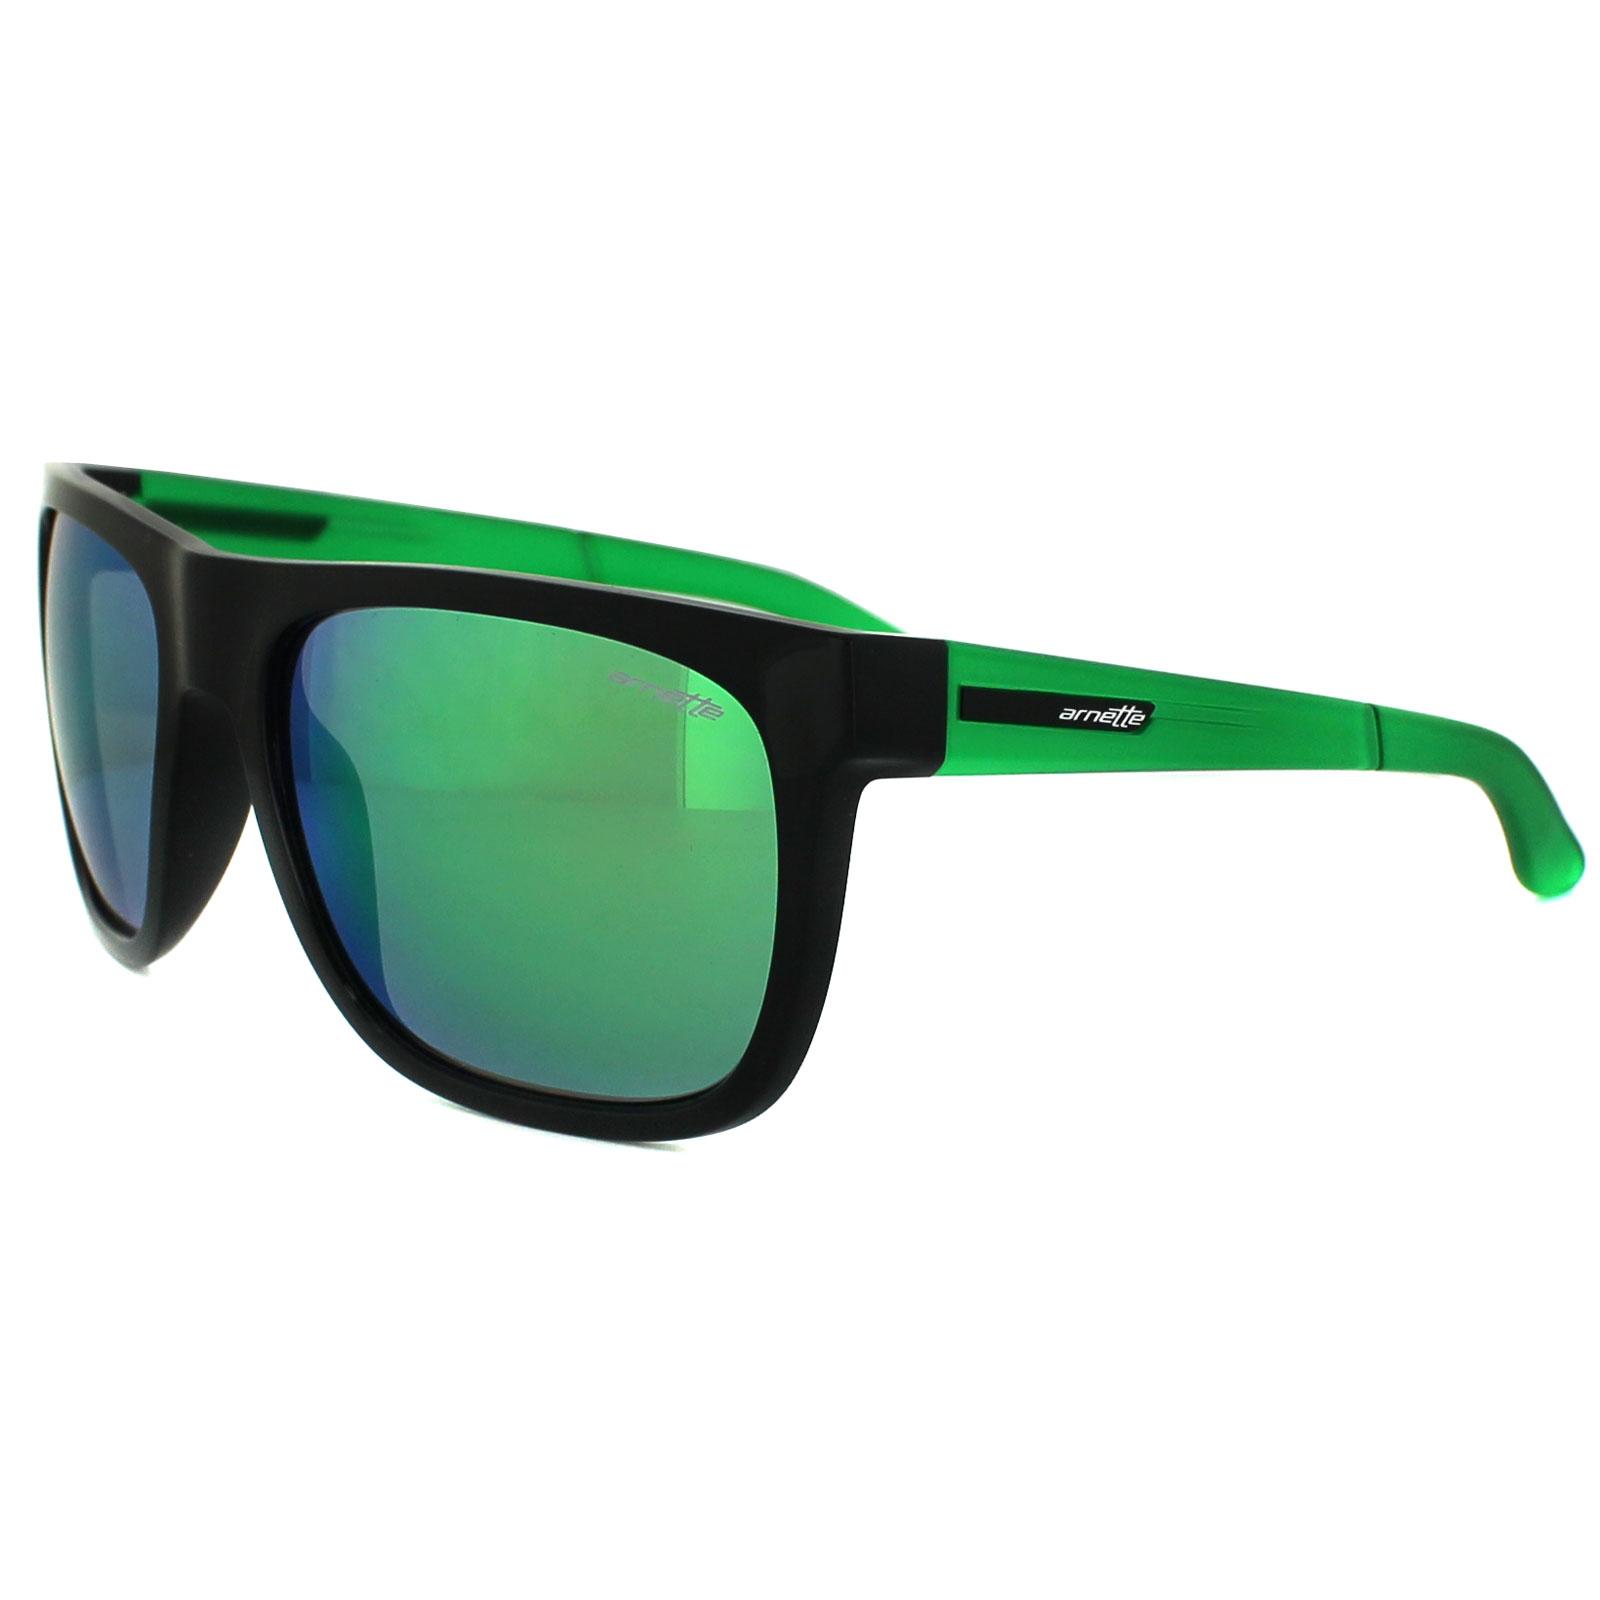 f56a49837fd Sentinel Arnette Sunglasses 4143 Fire Drill 22453R Shiny Black    Transparent Green Green